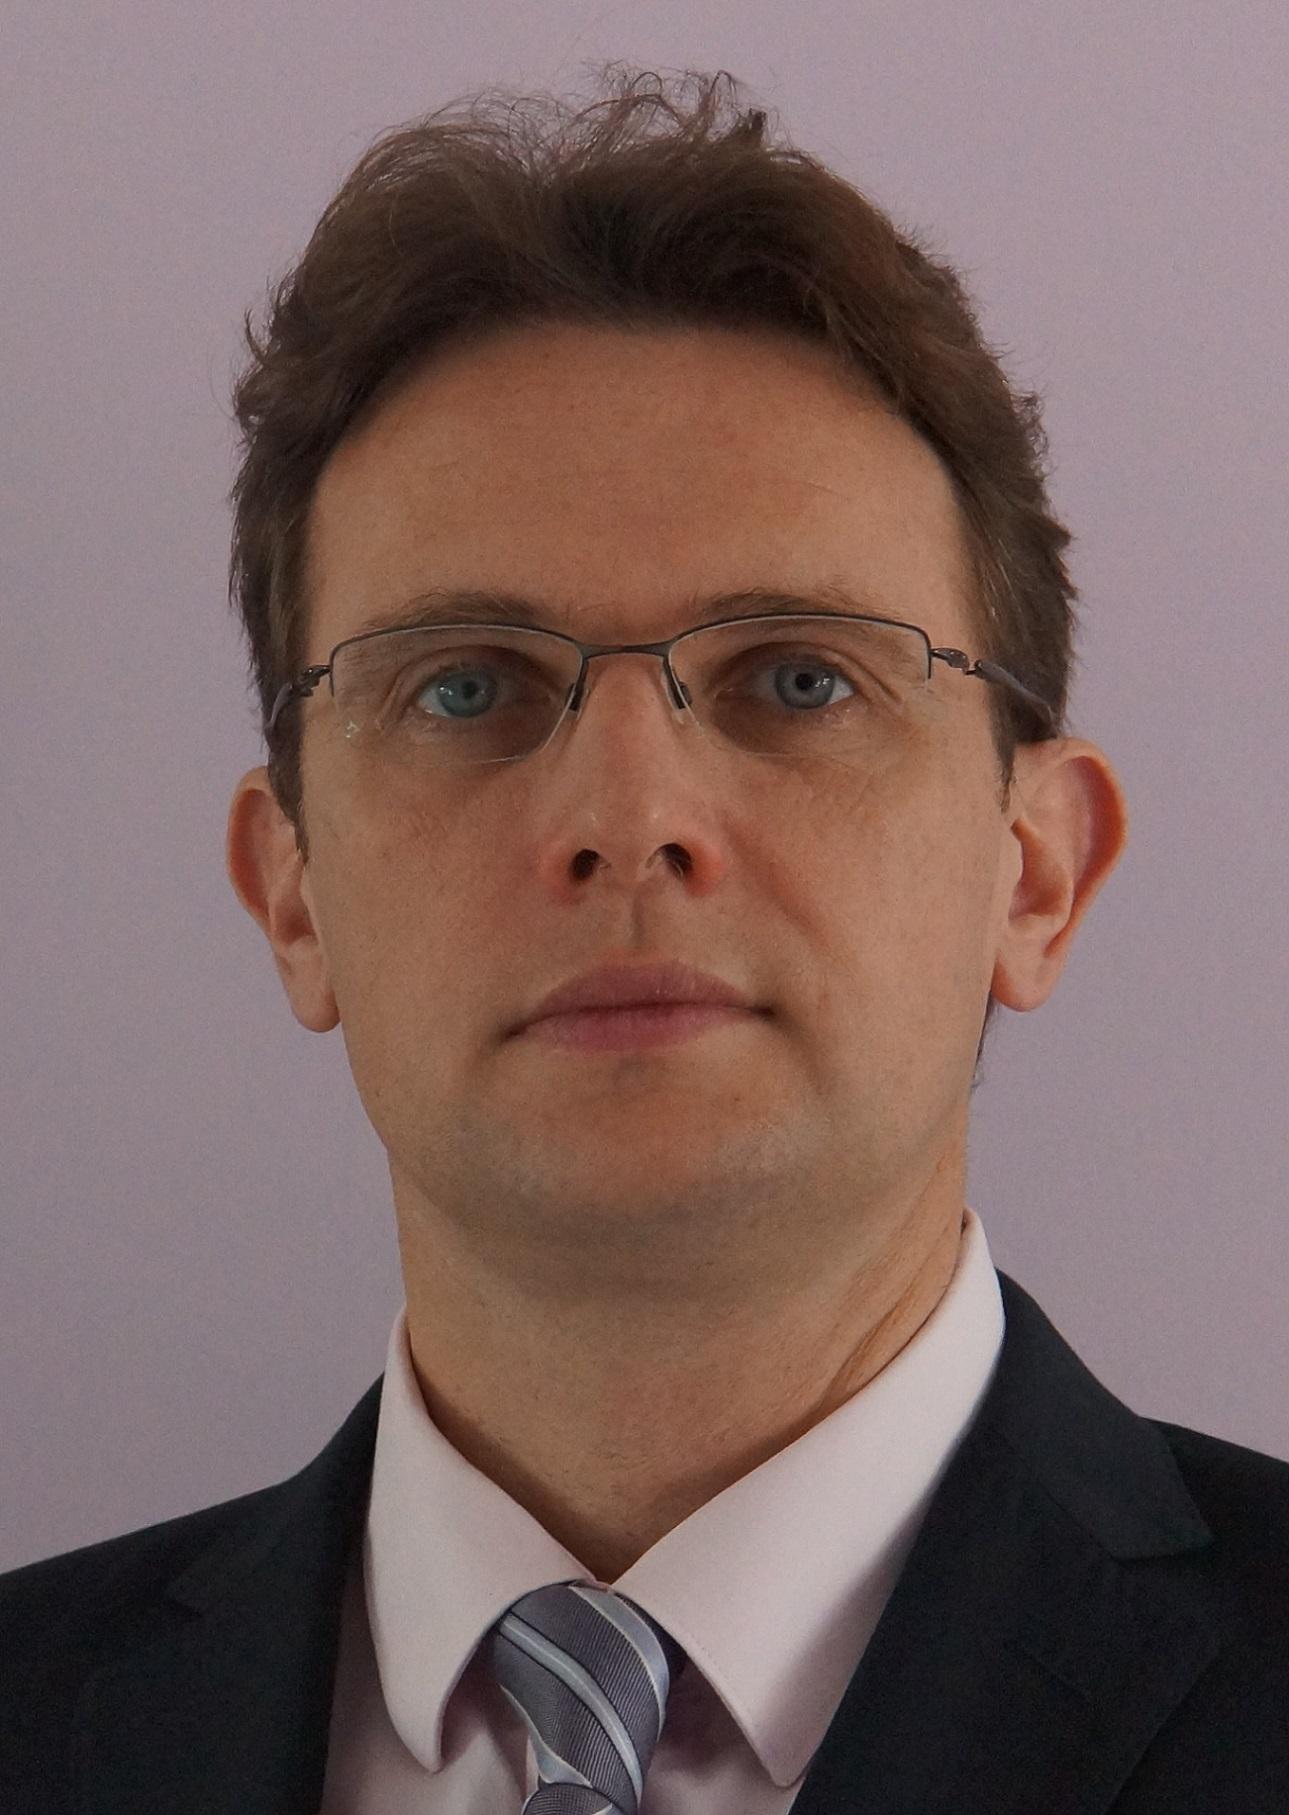 EmmanuelMermoz